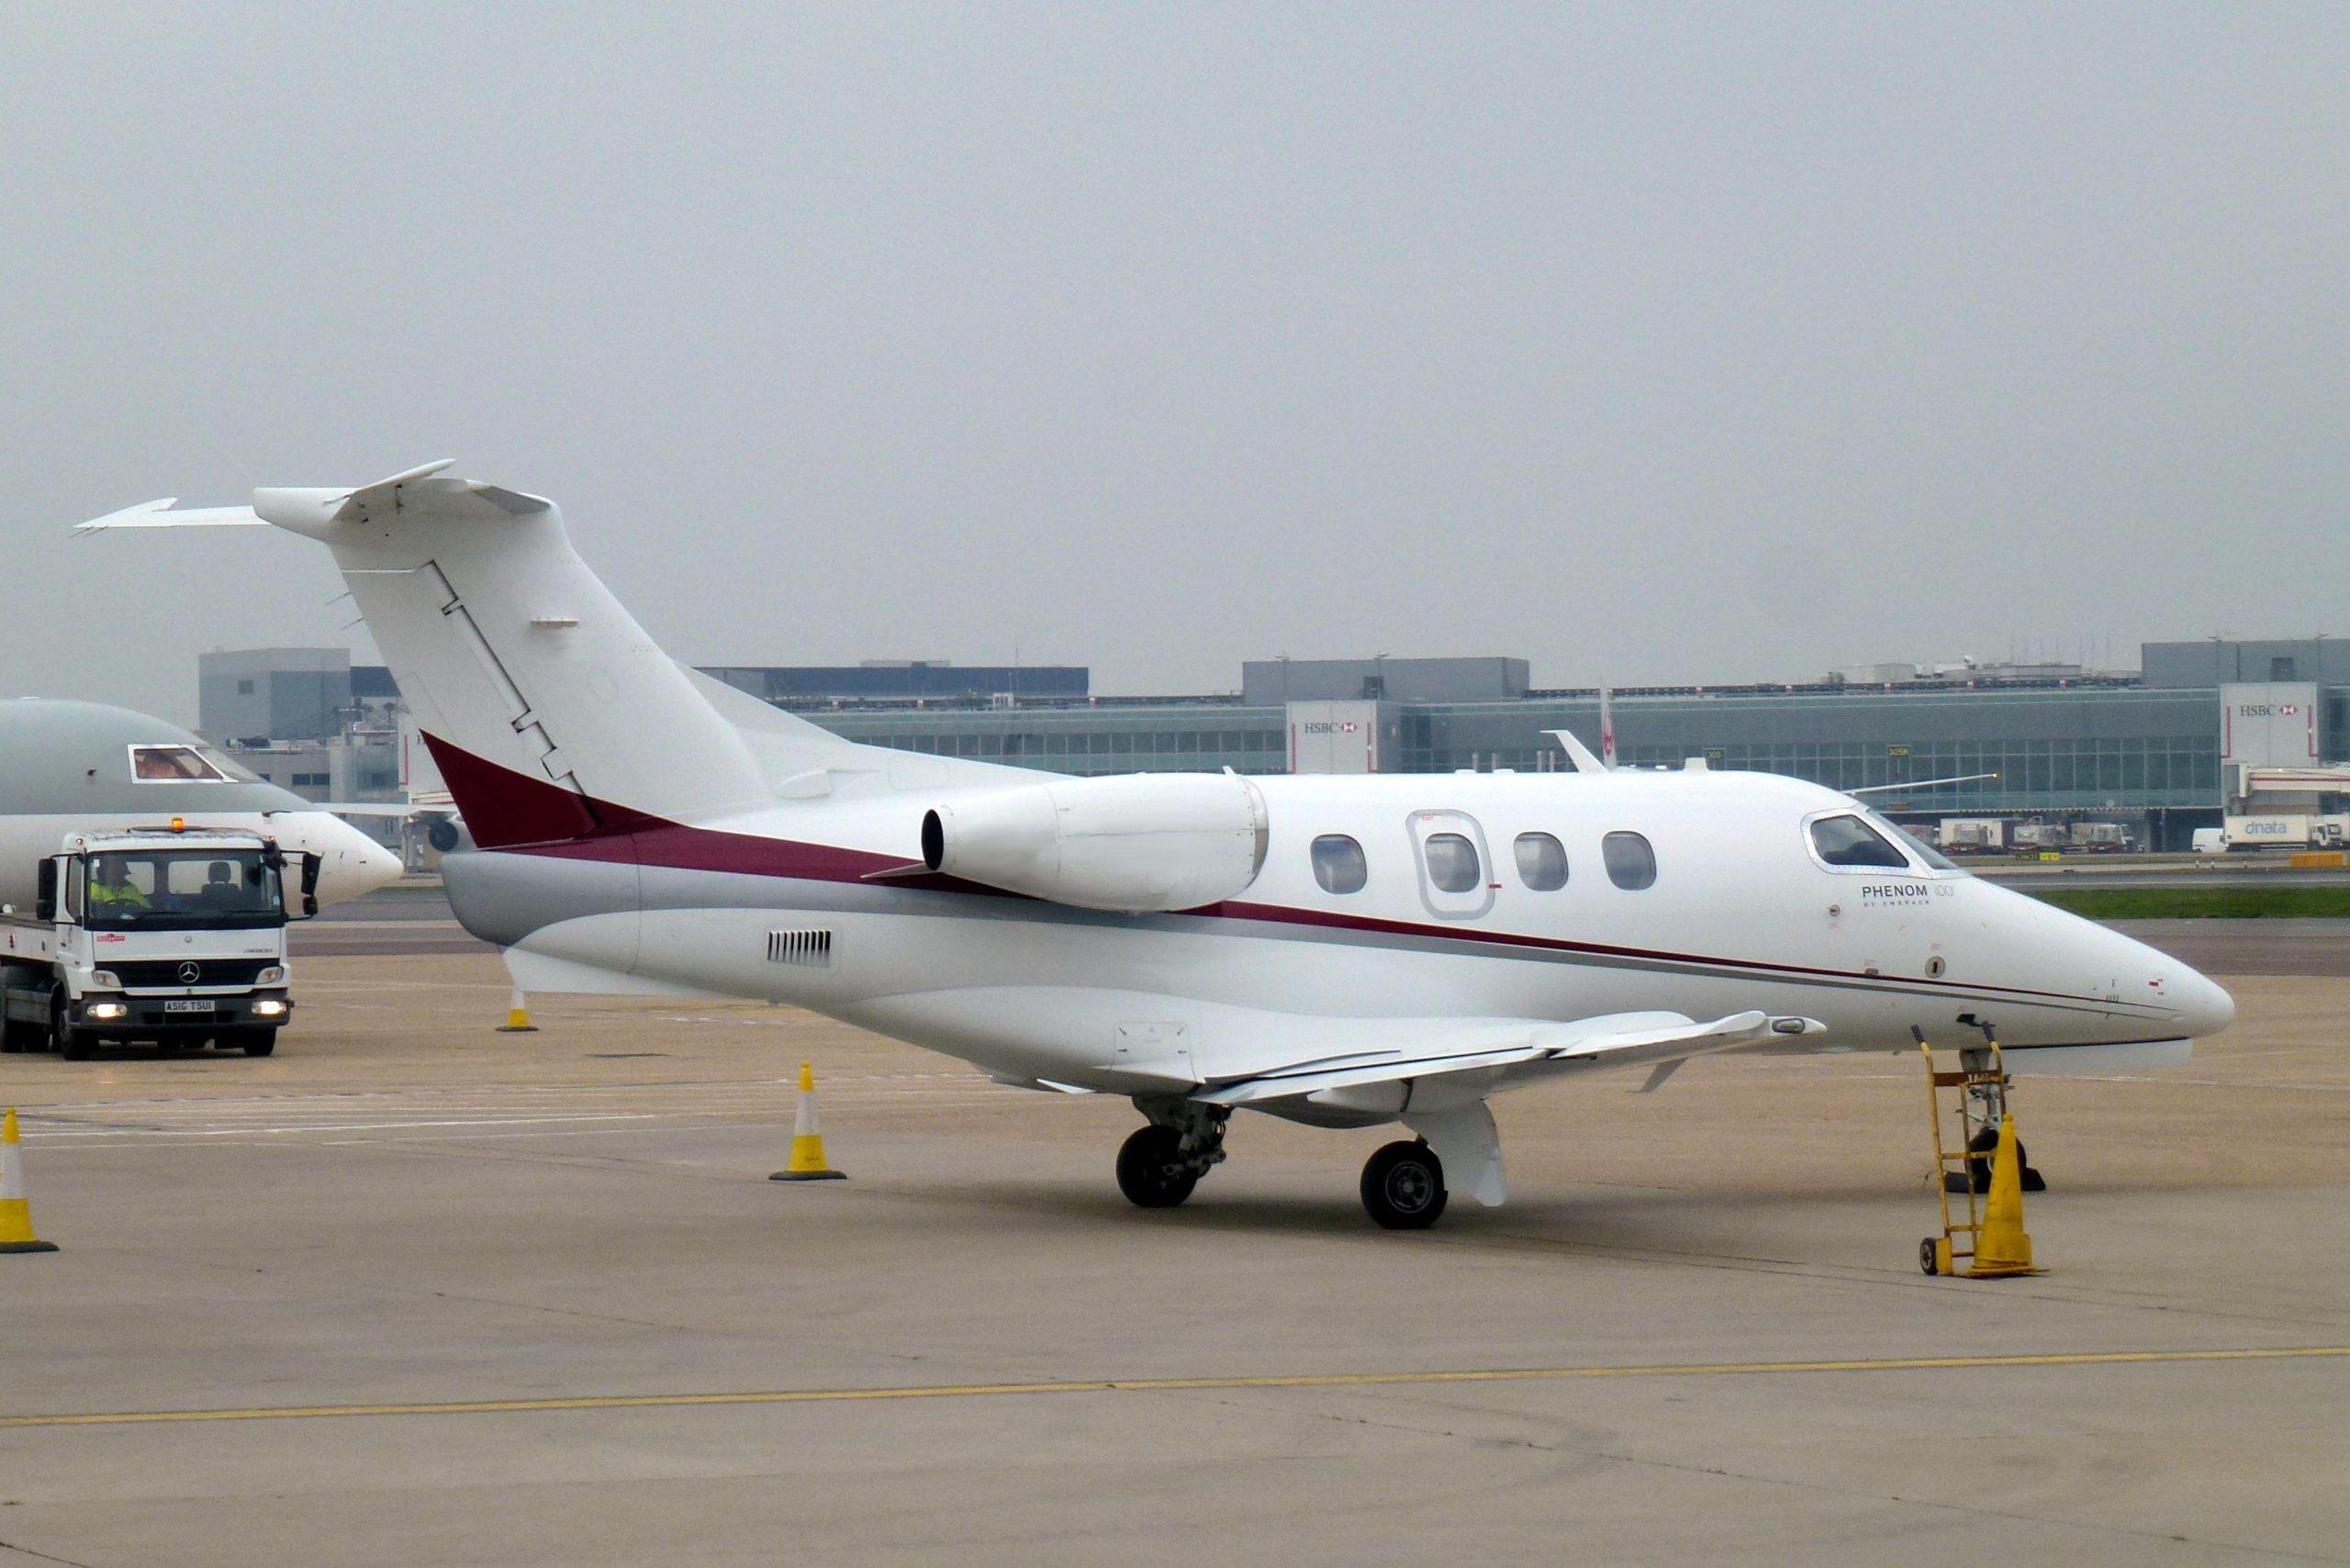 Embraer Phenom 100 for sale